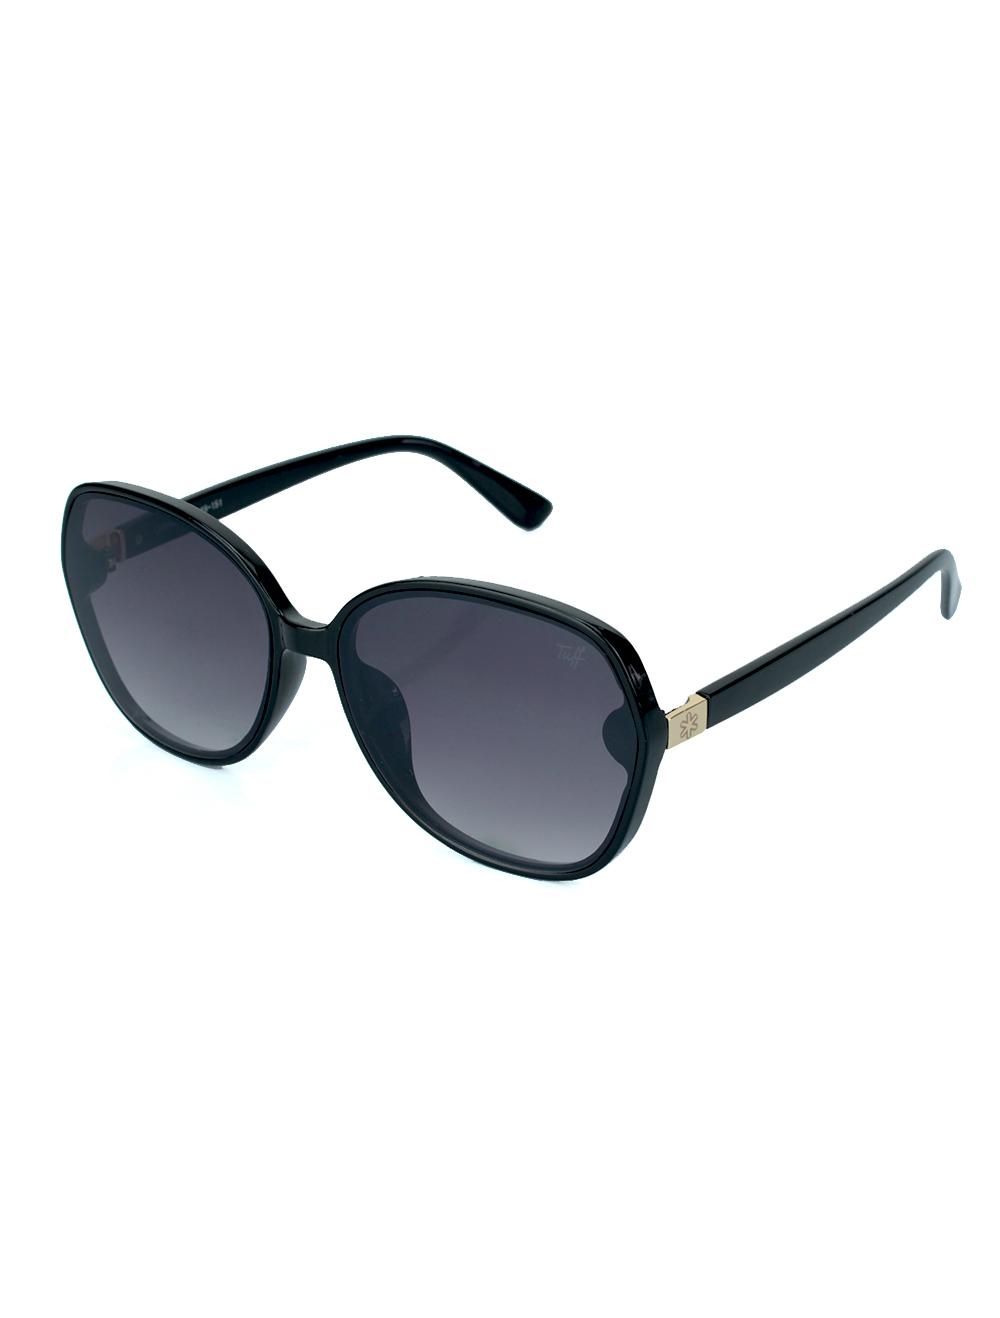 Sunglasses Arredondado Preto